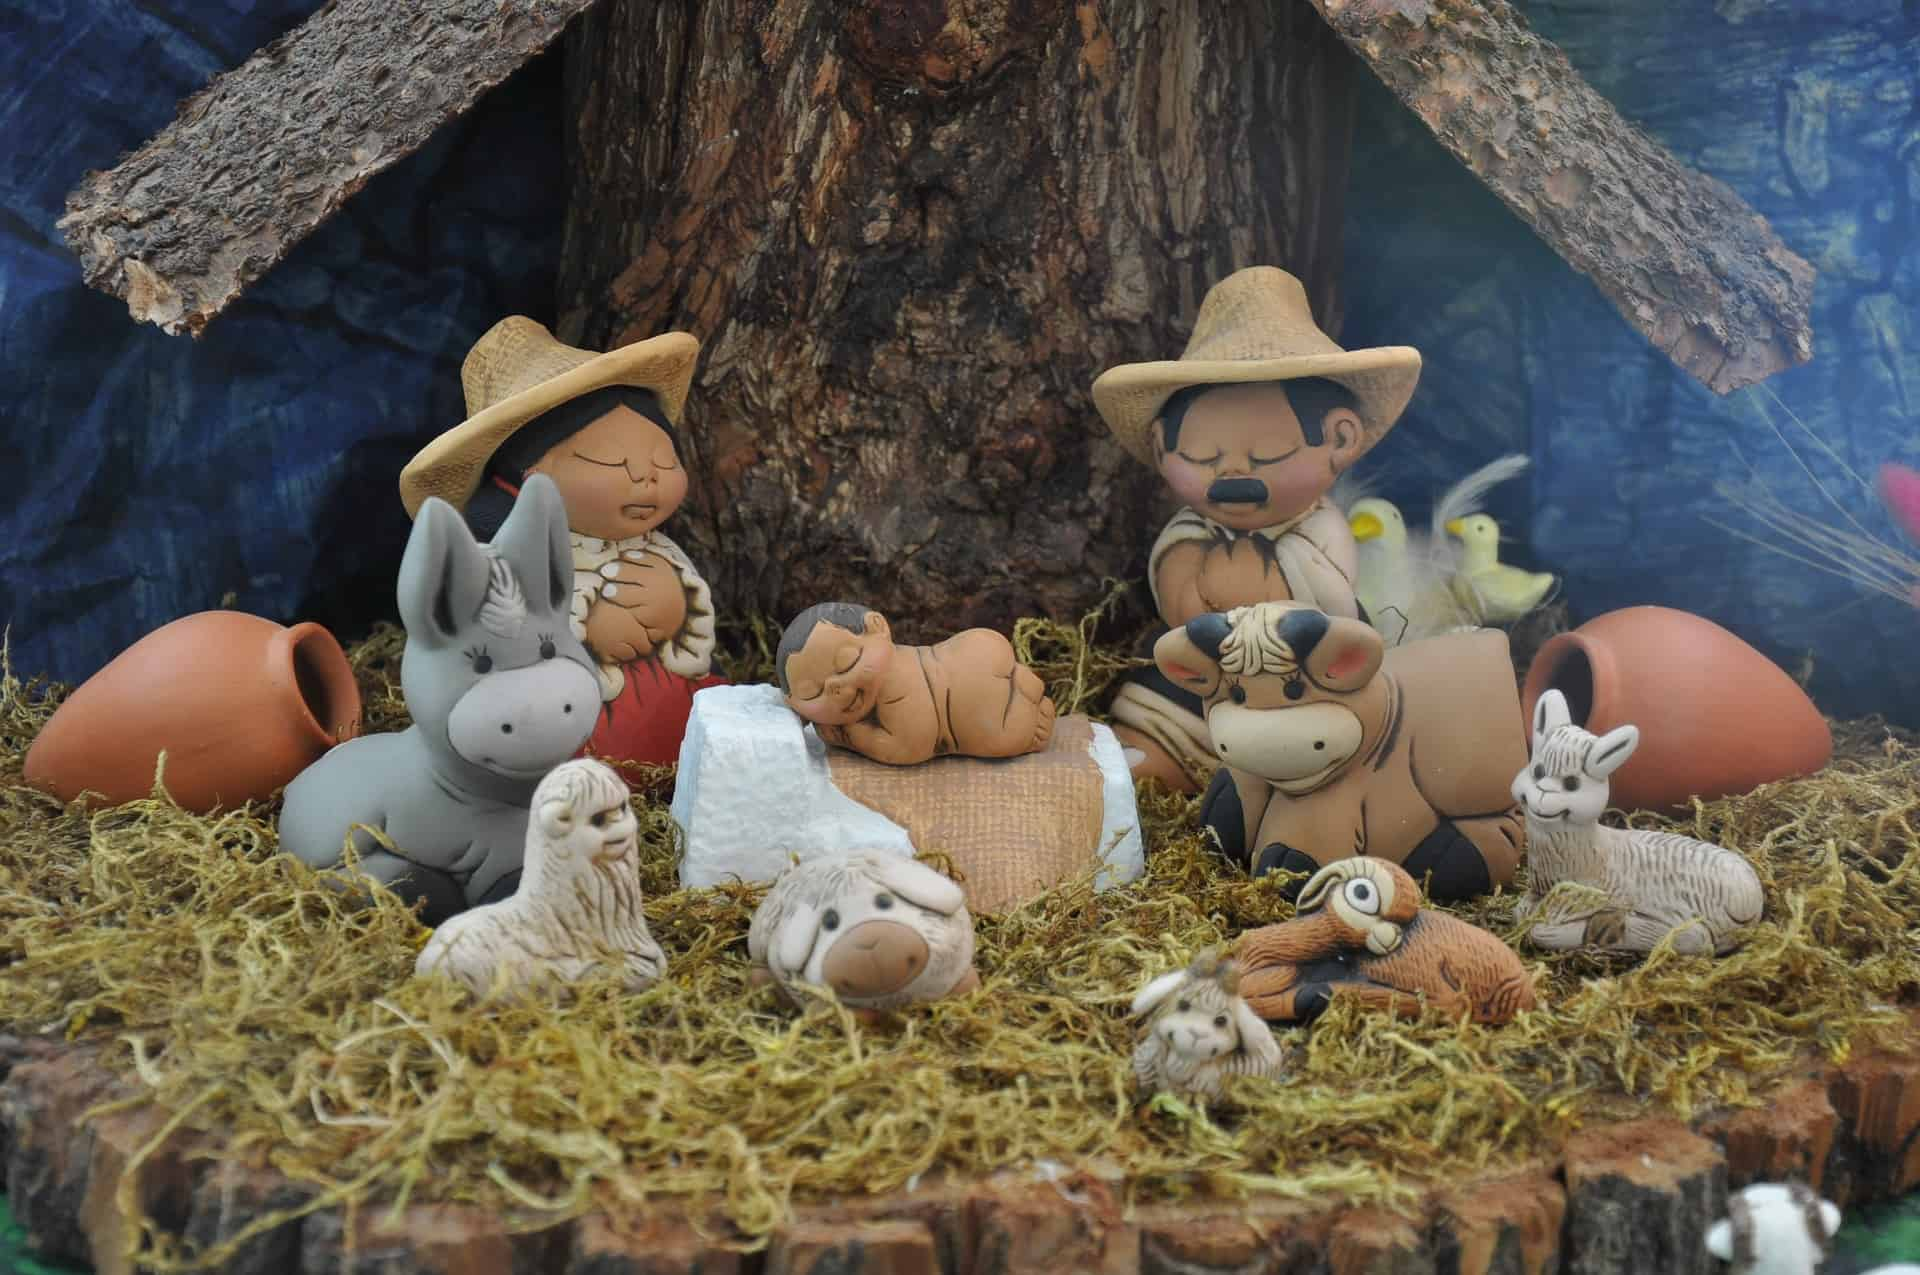 Spanish Christmas Songs for Kids: The Best of YouTube